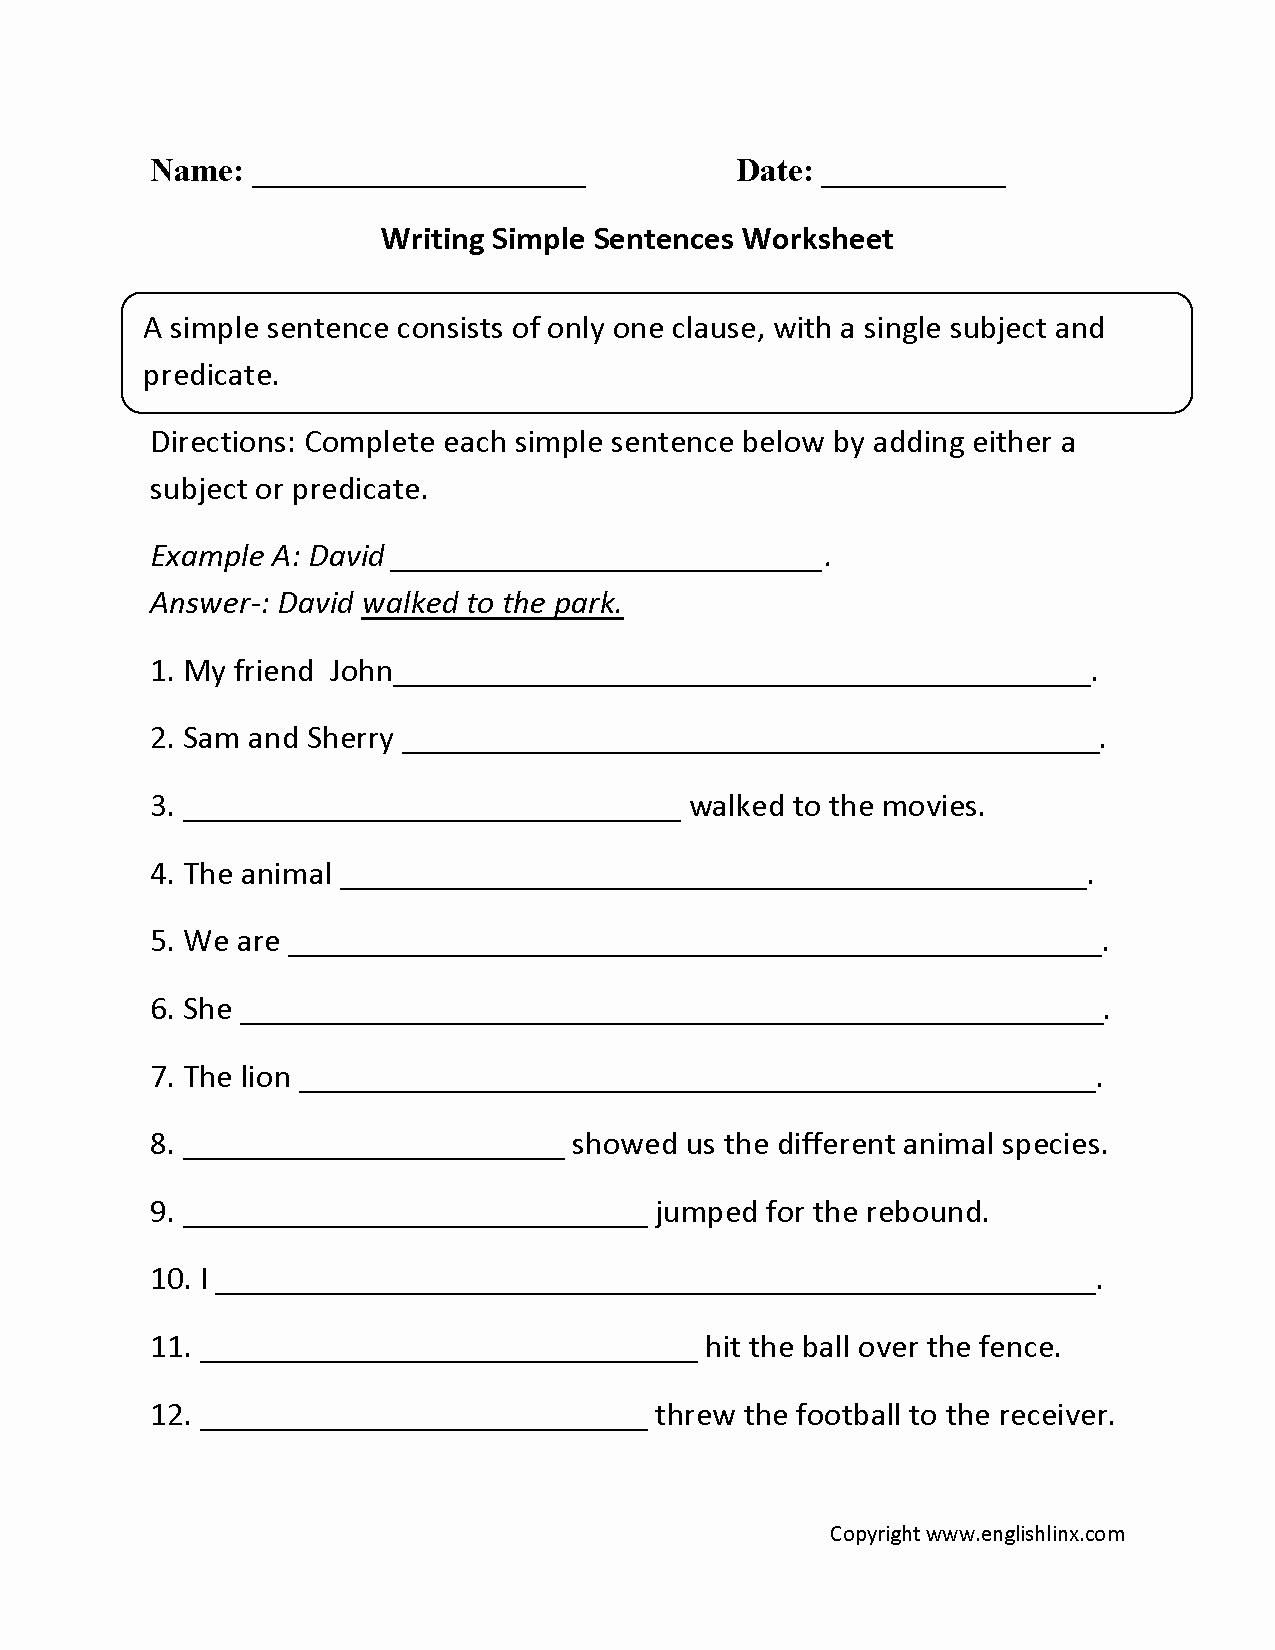 Writing Sentences Worksheets Inspirational Sentences Worksheets